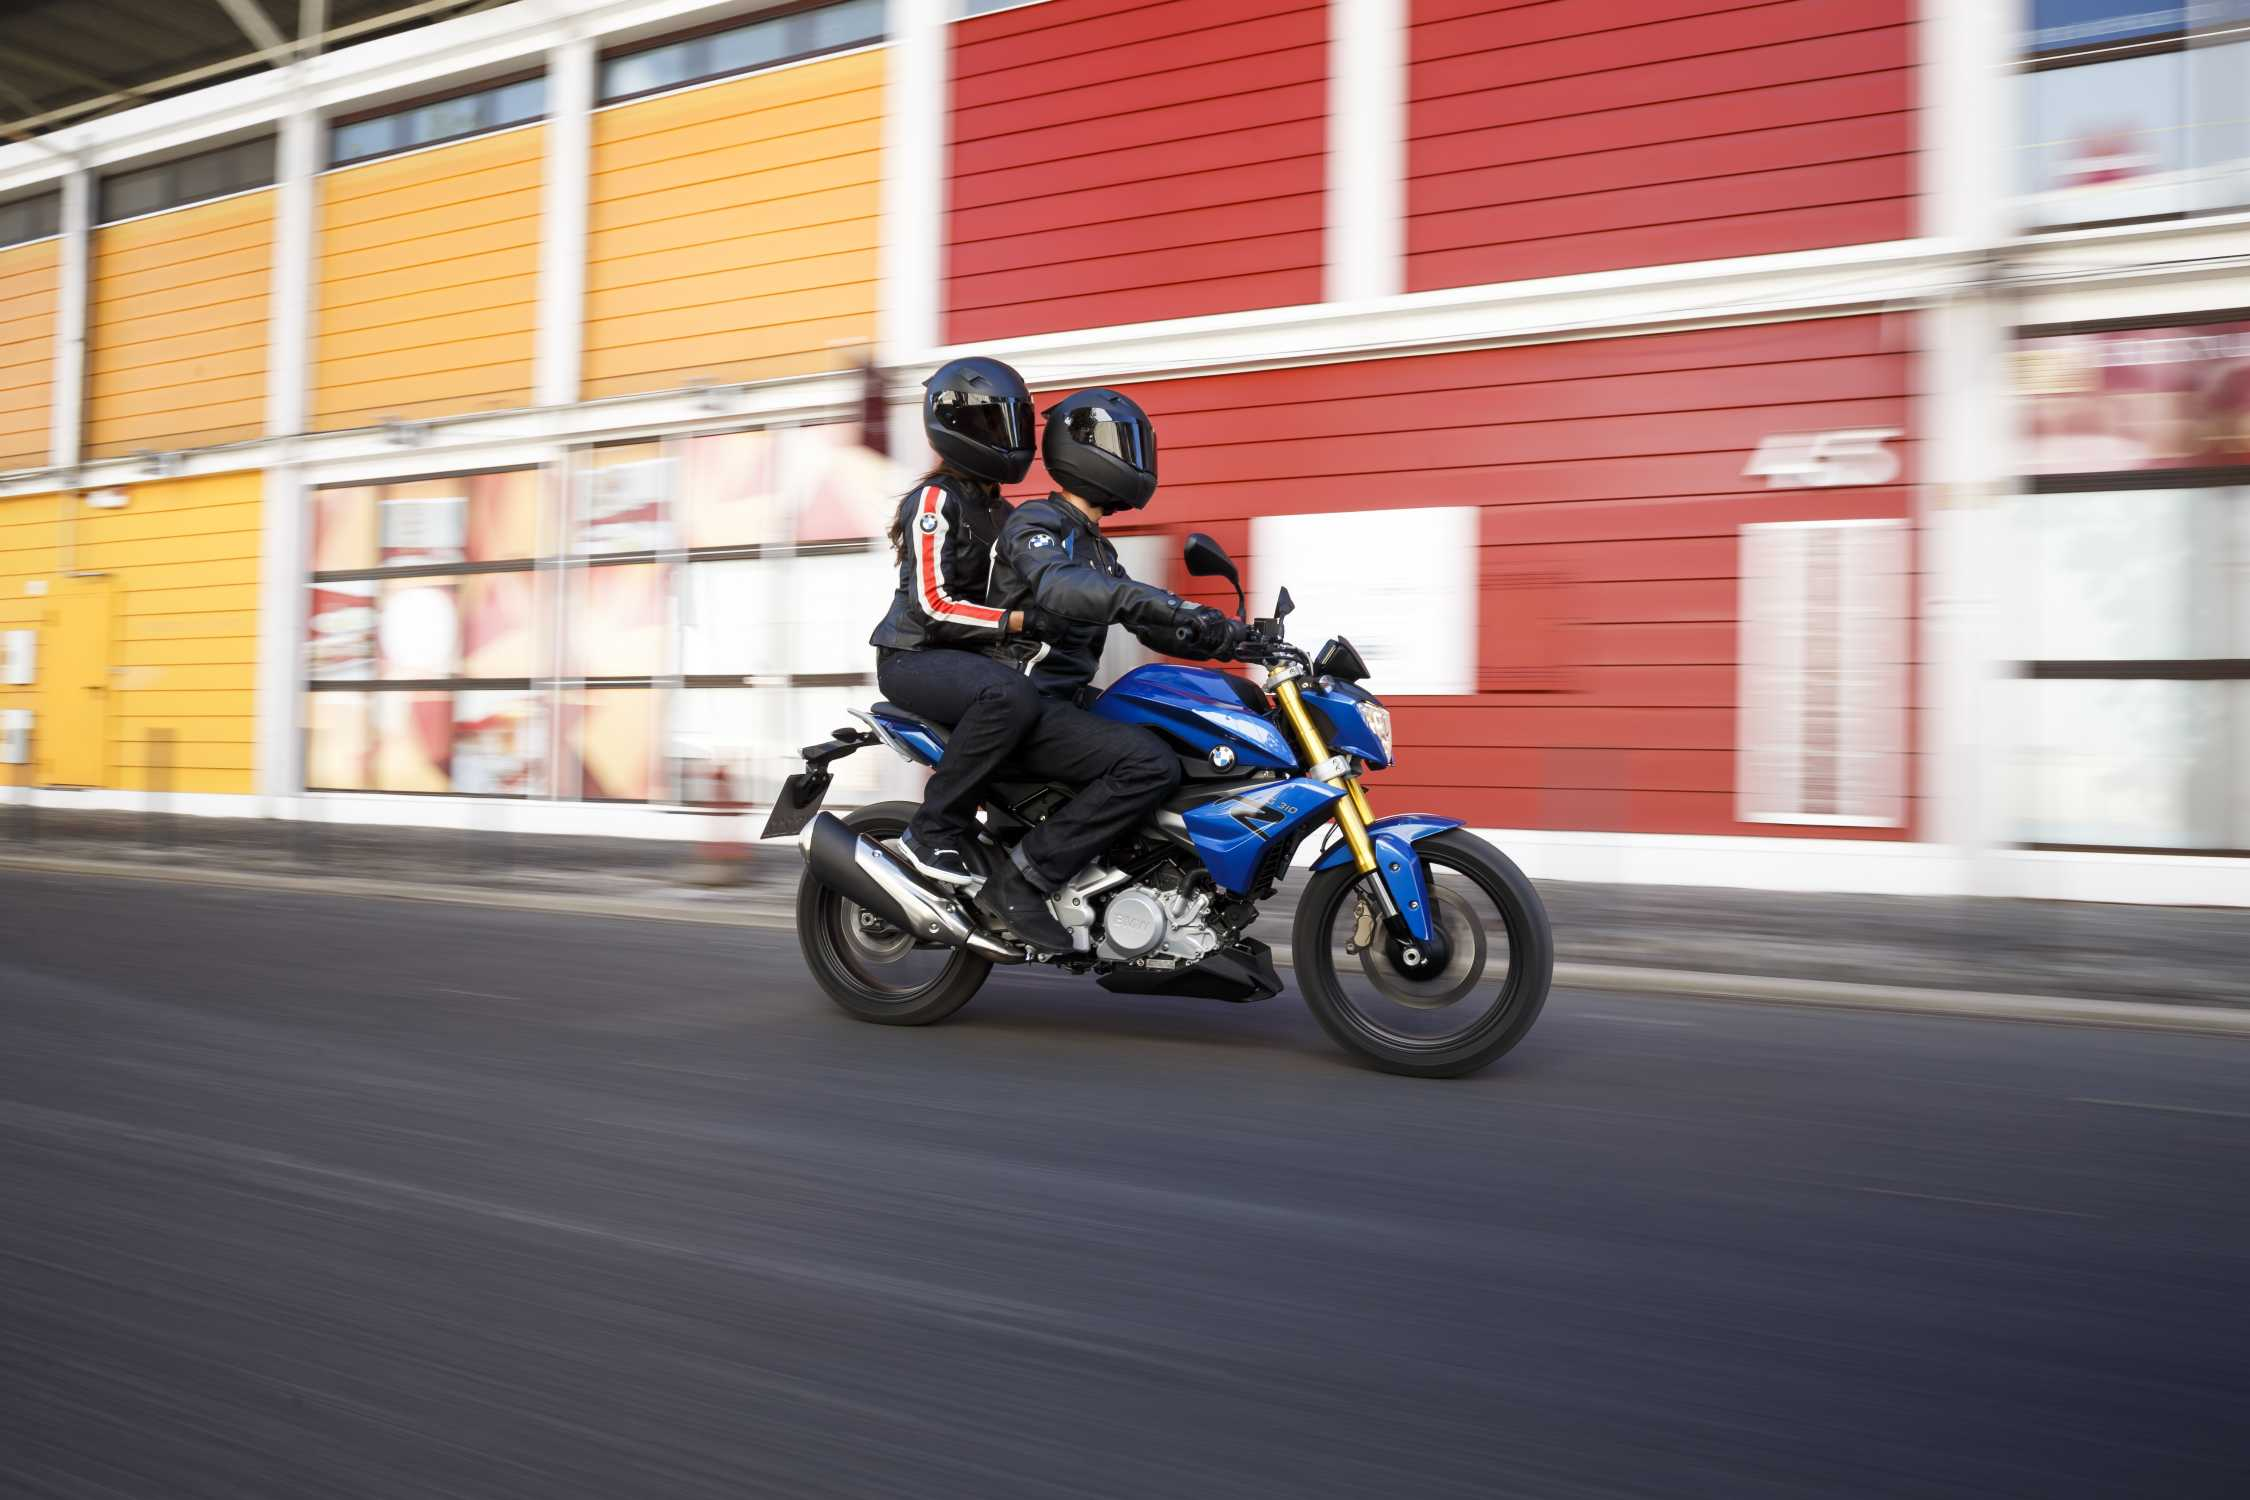 BMW G310R (БМВ Г310Р) мотоцикл ... - kolesa.ru